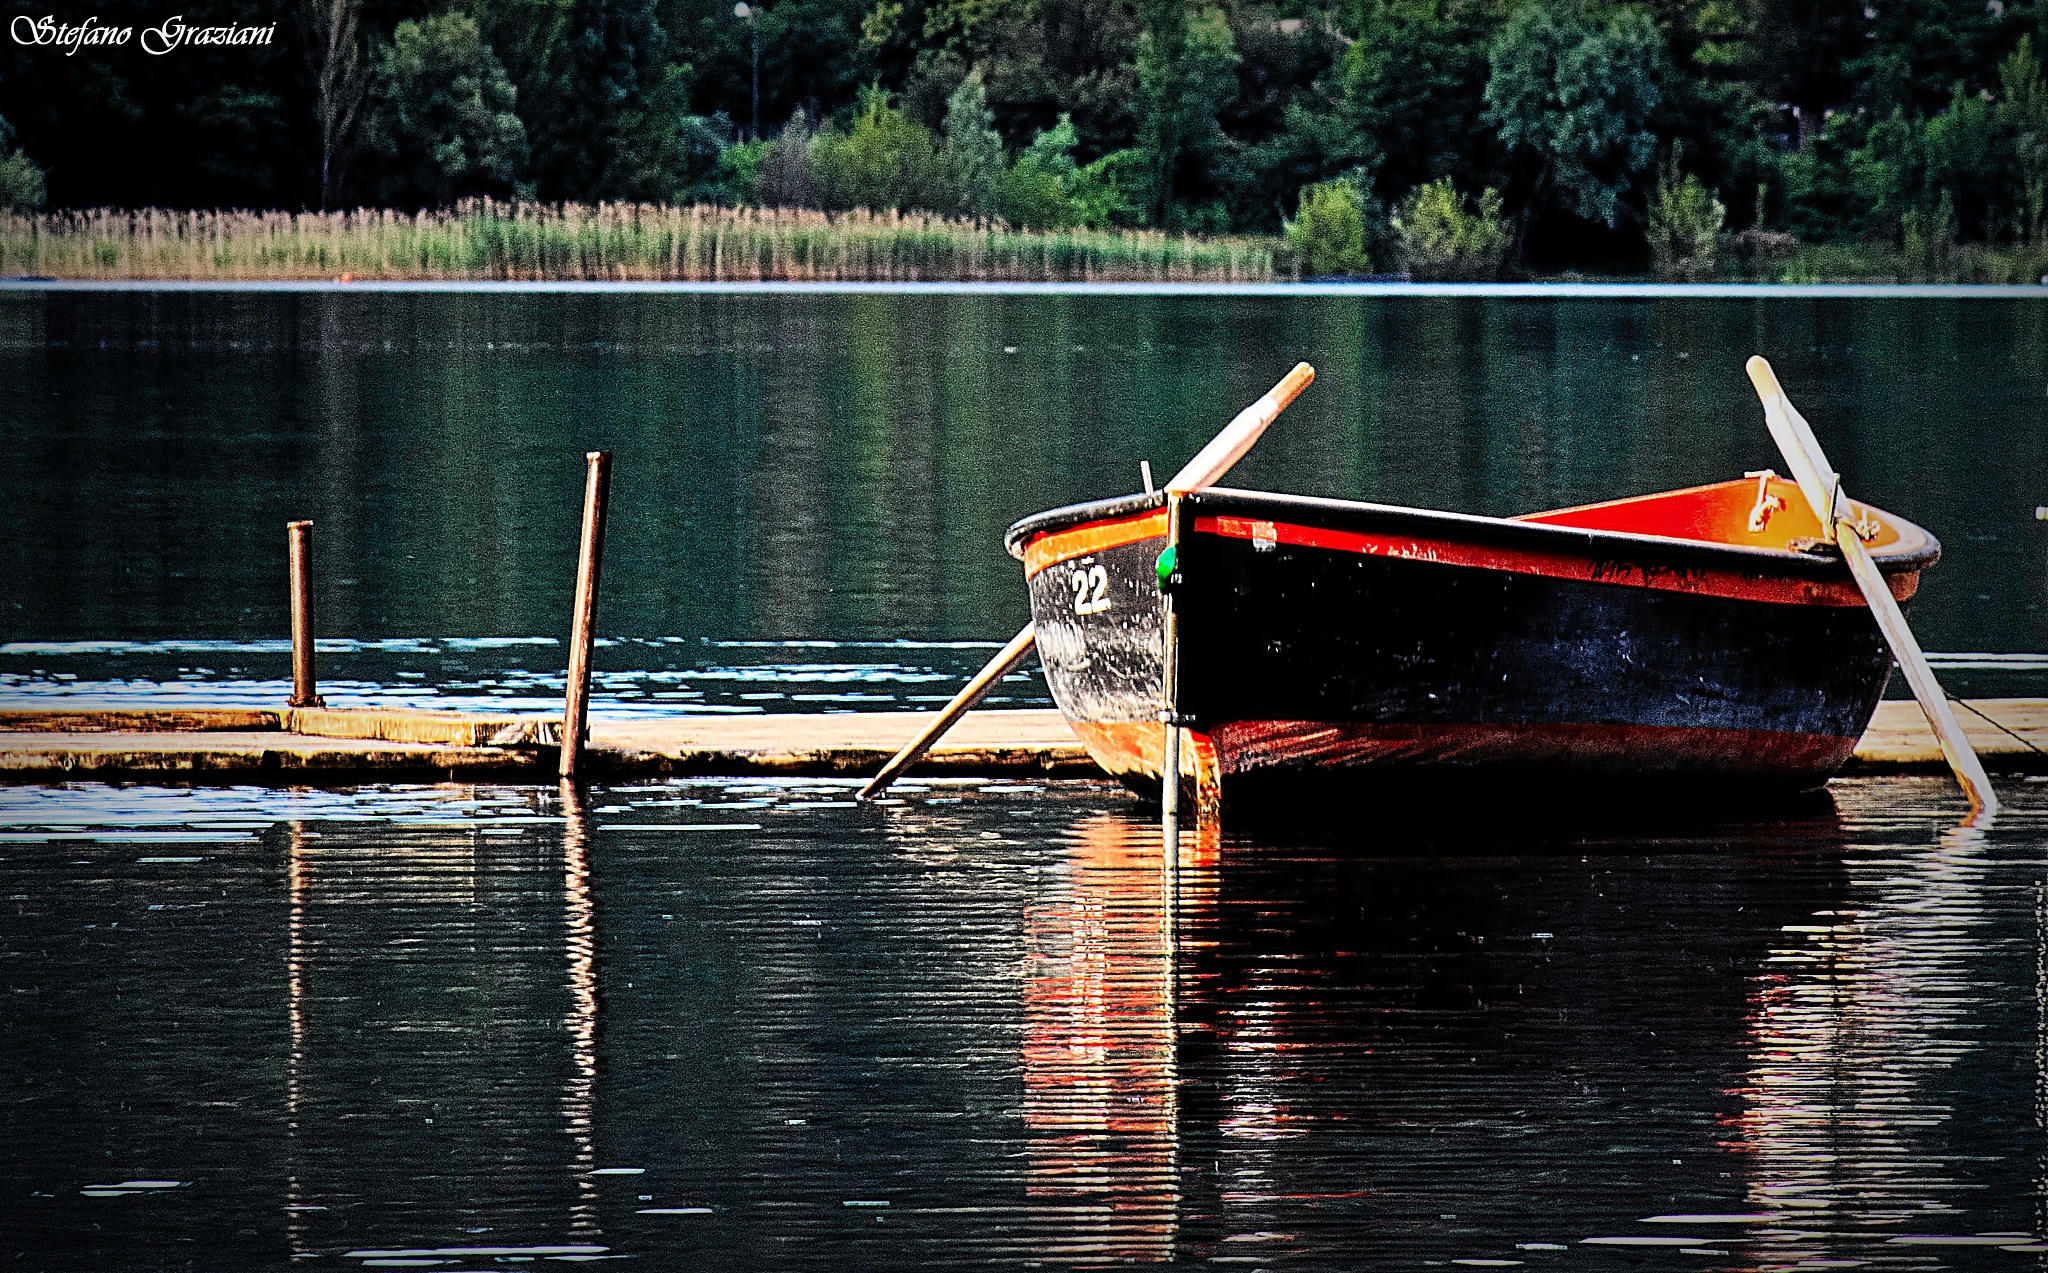 Un giro in barca by Stefano Graziani